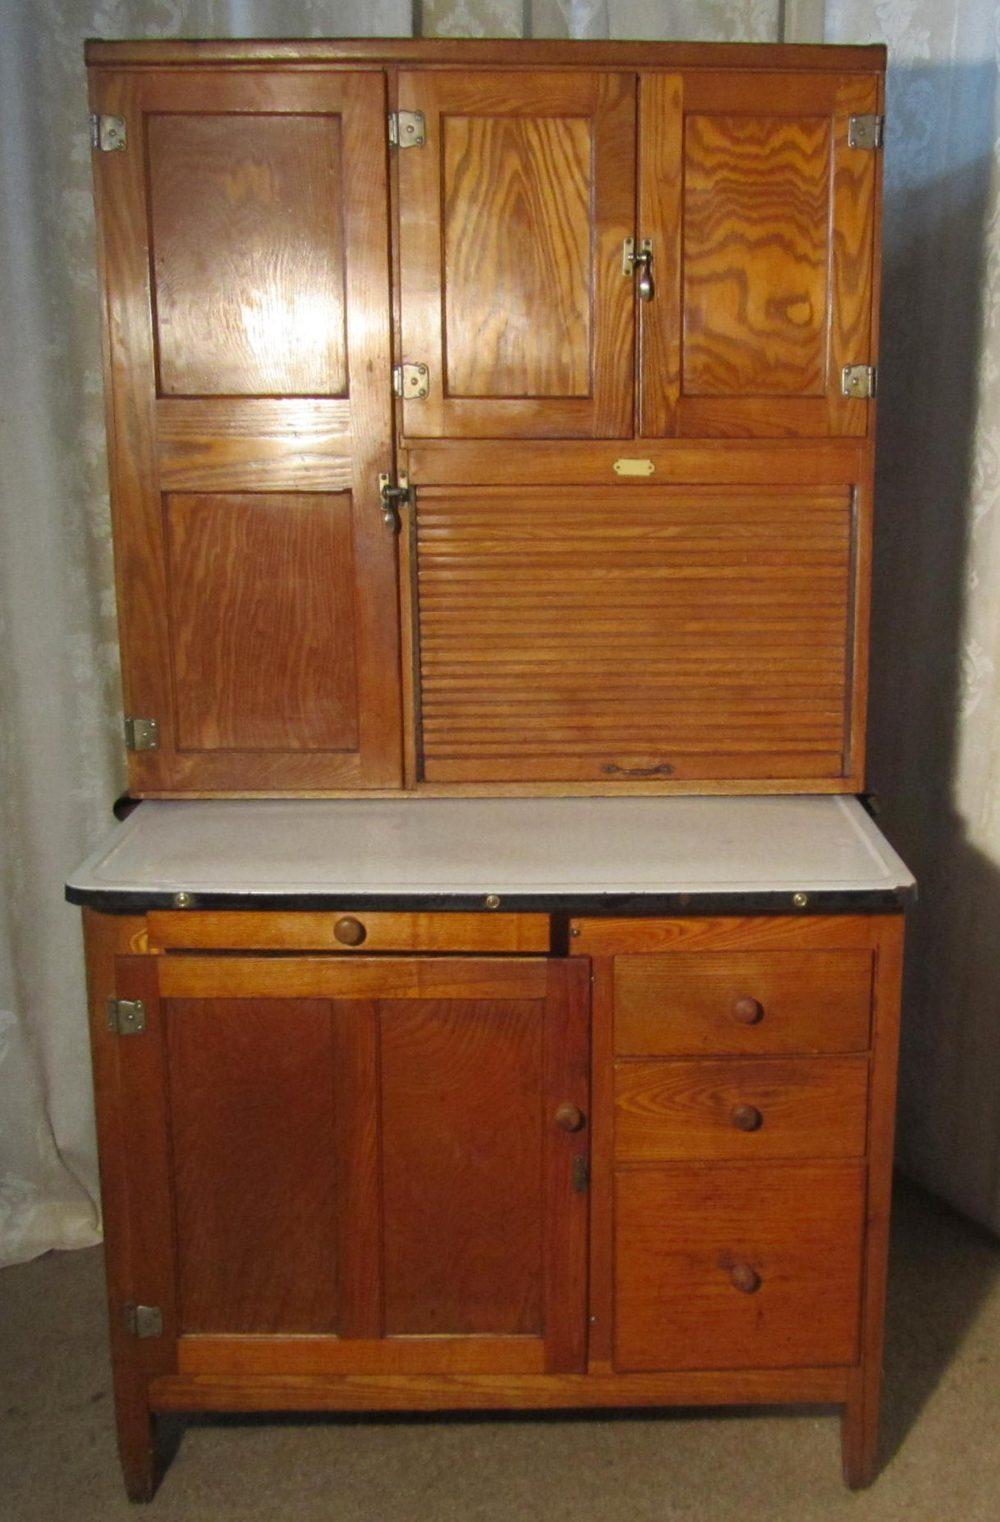 An art deco hoosier kitchen cabinet dresser antiques atlas - Art deco kitchen cabinets ...